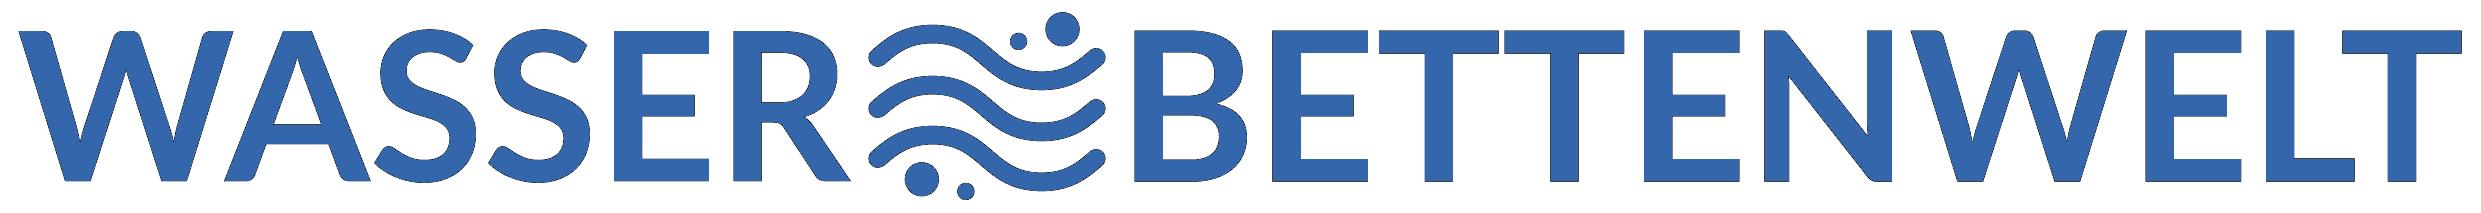 Wasserbettenwerk-Logo